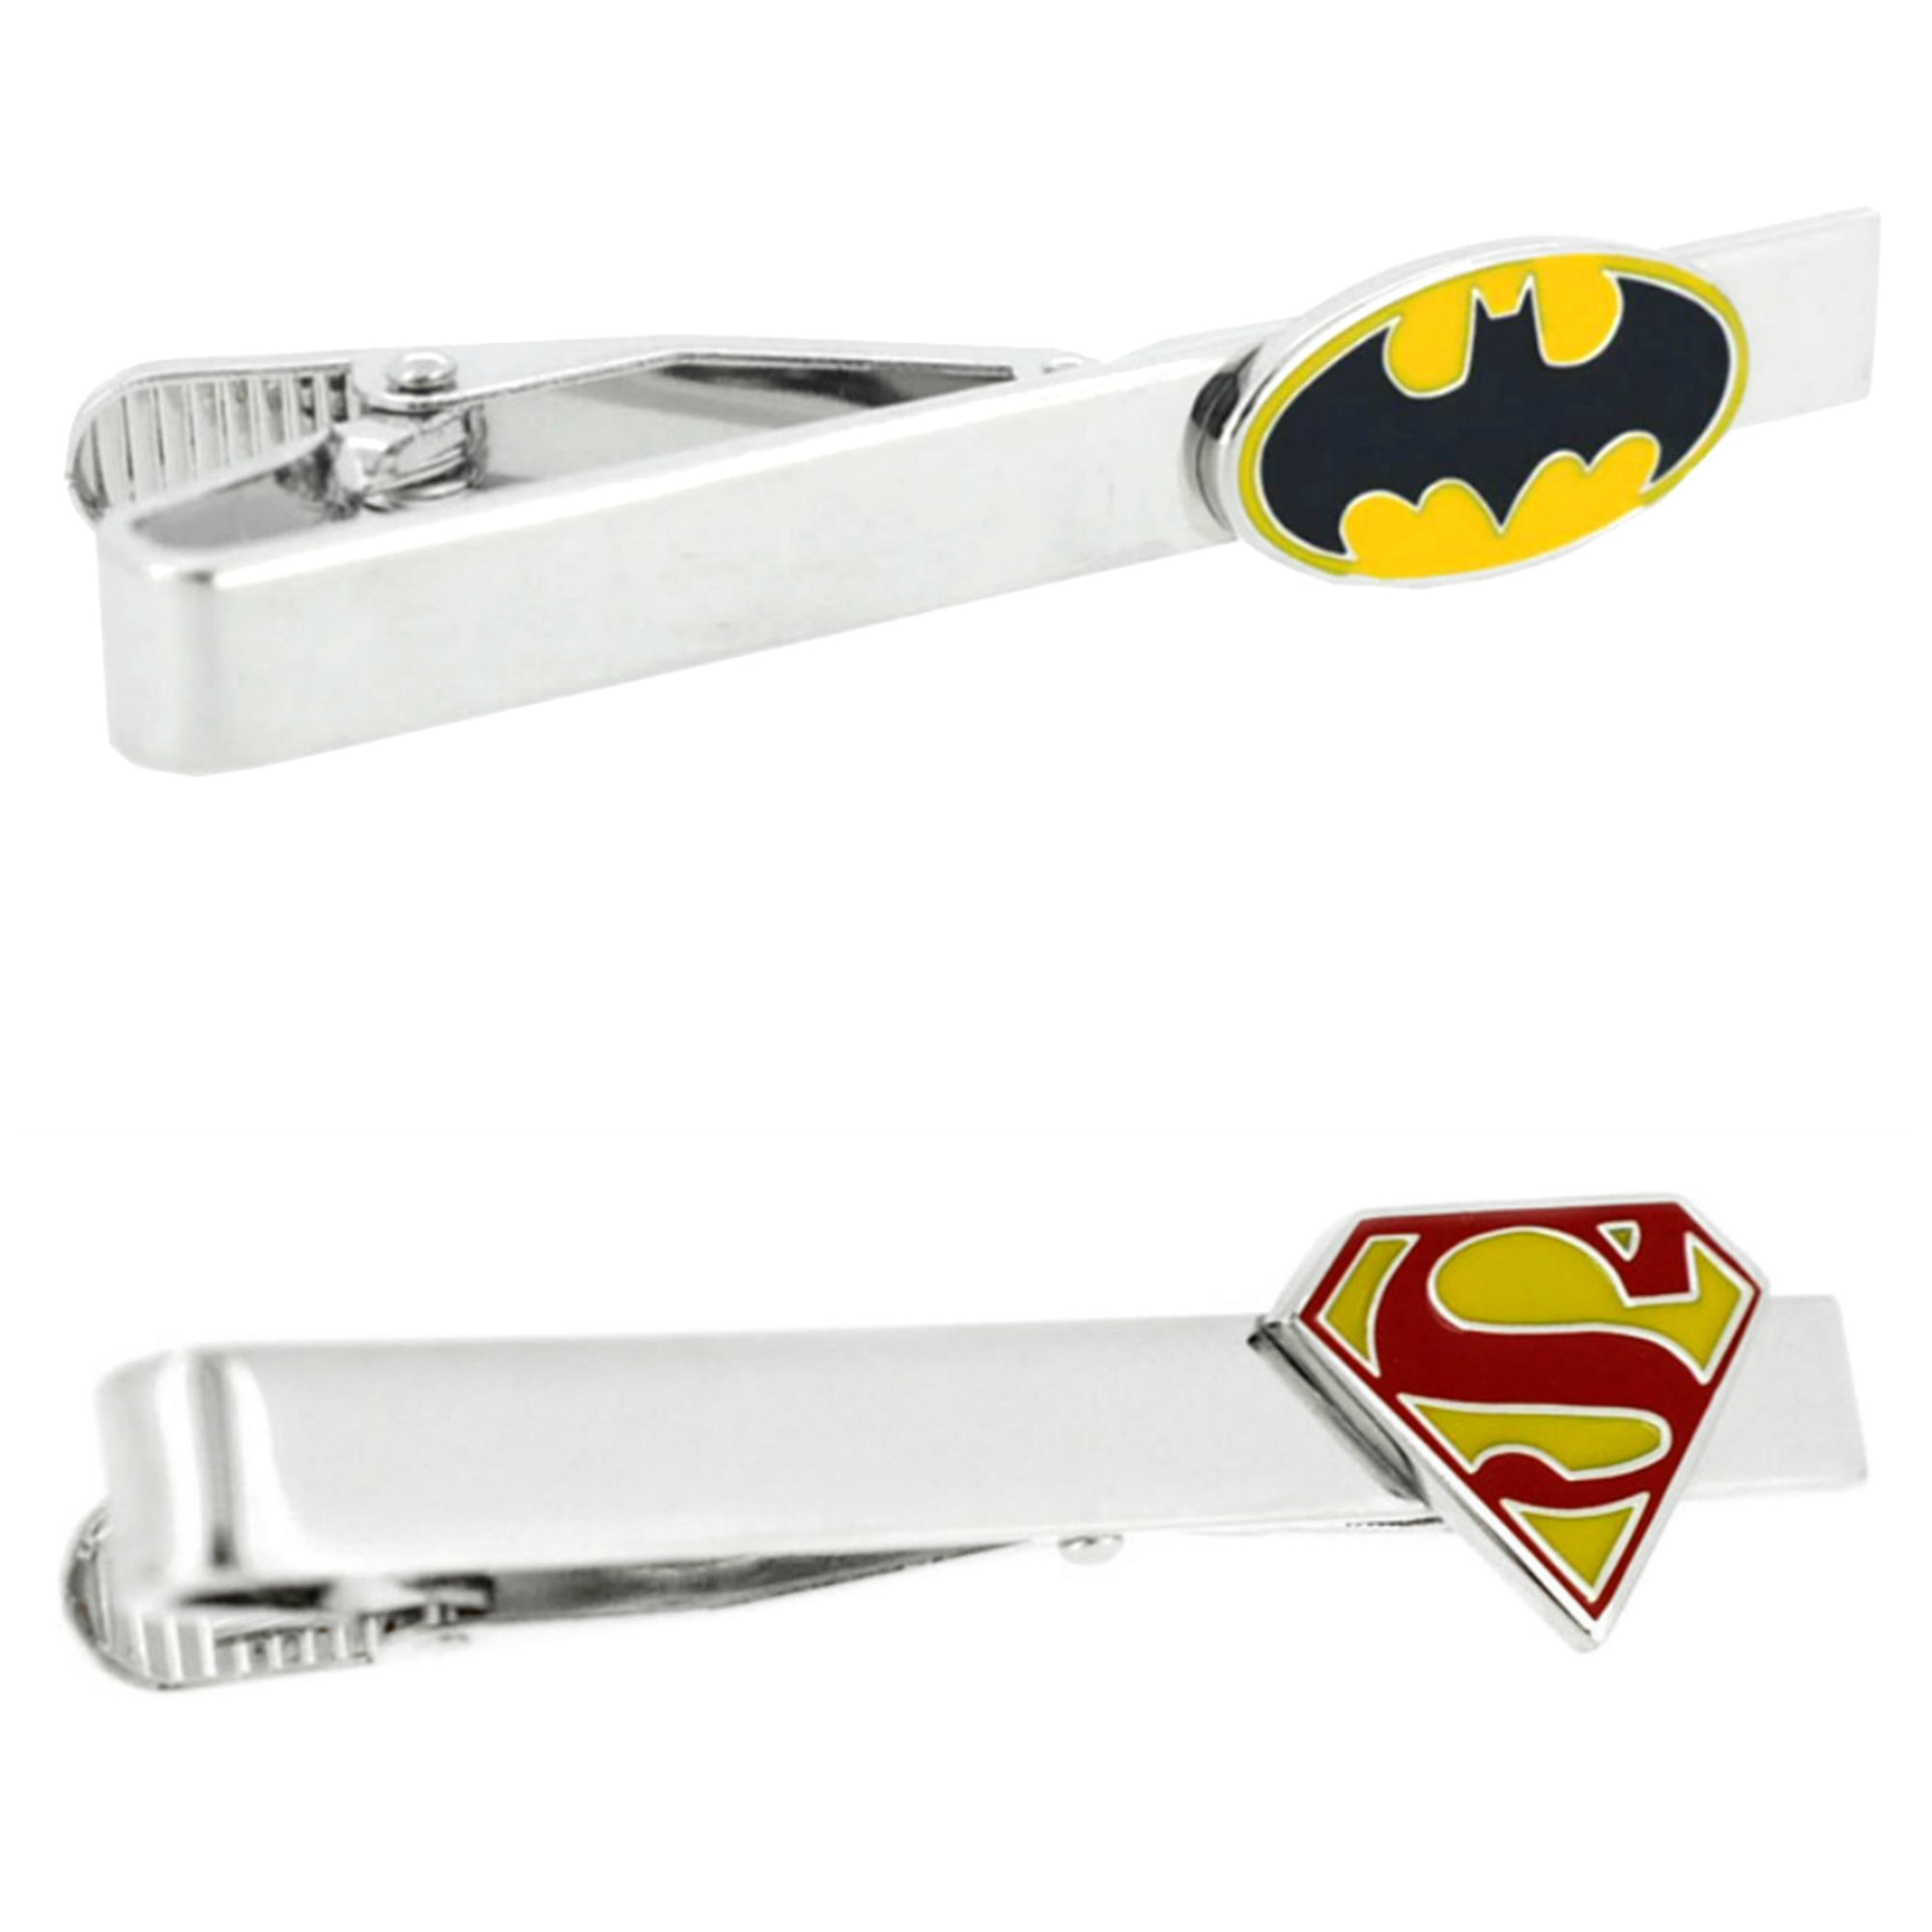 Outlander DC Comics - Batman & Robin - Tiebar Tie Clasp Set of 2 Wedding Superhero Logo w/Gift Box